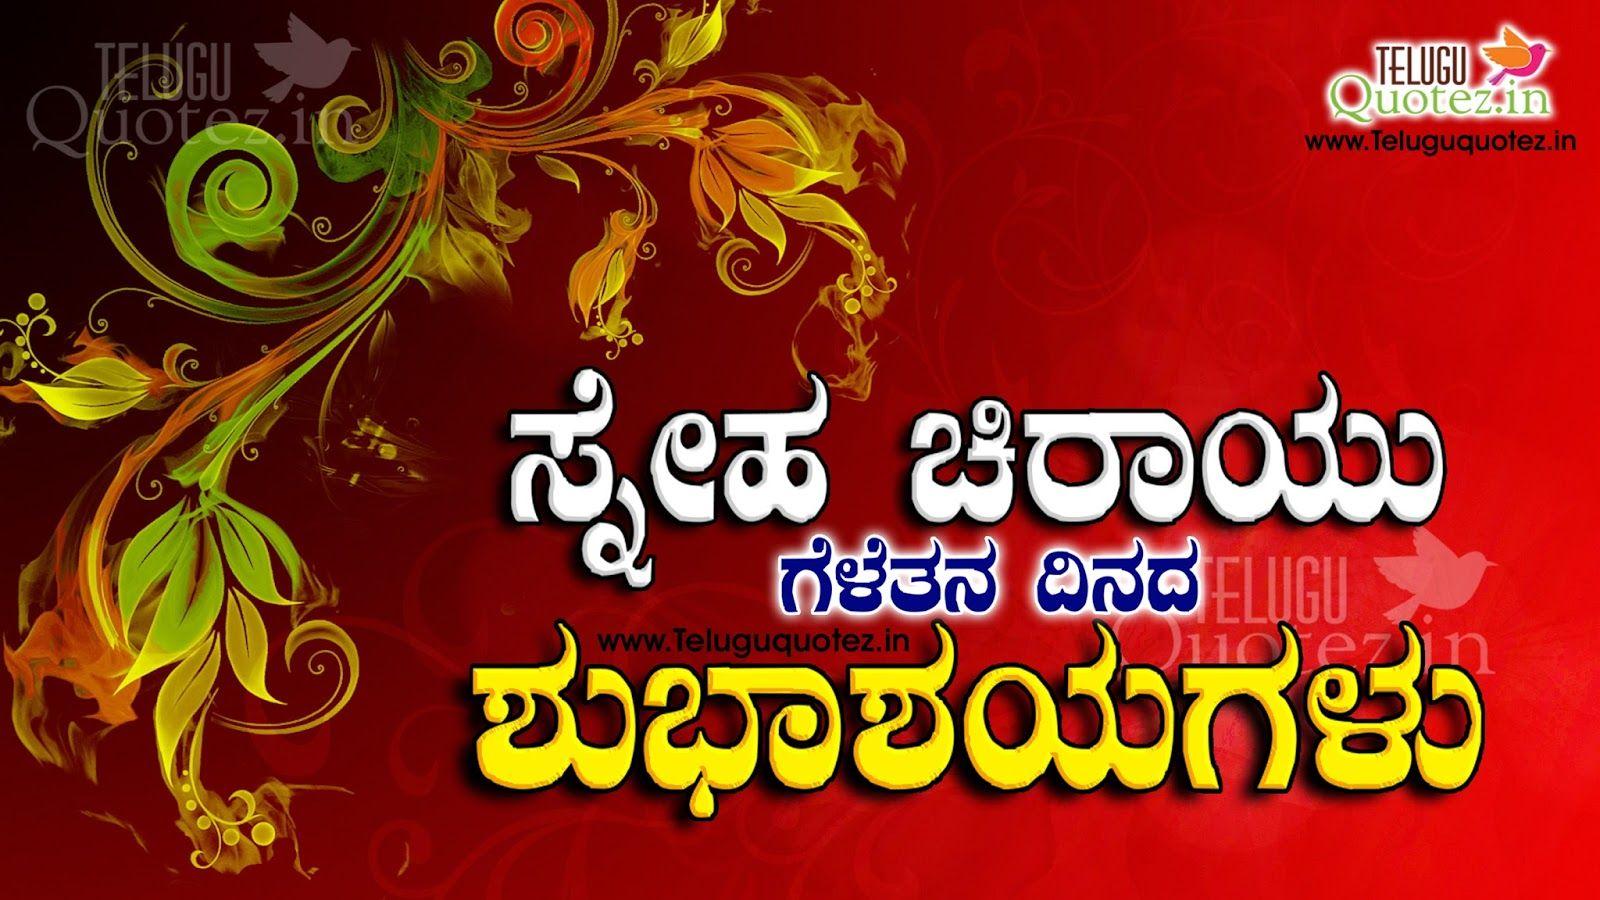 Happy Friendship Day Quotes In Kannada Language 02aug Teluguquotez